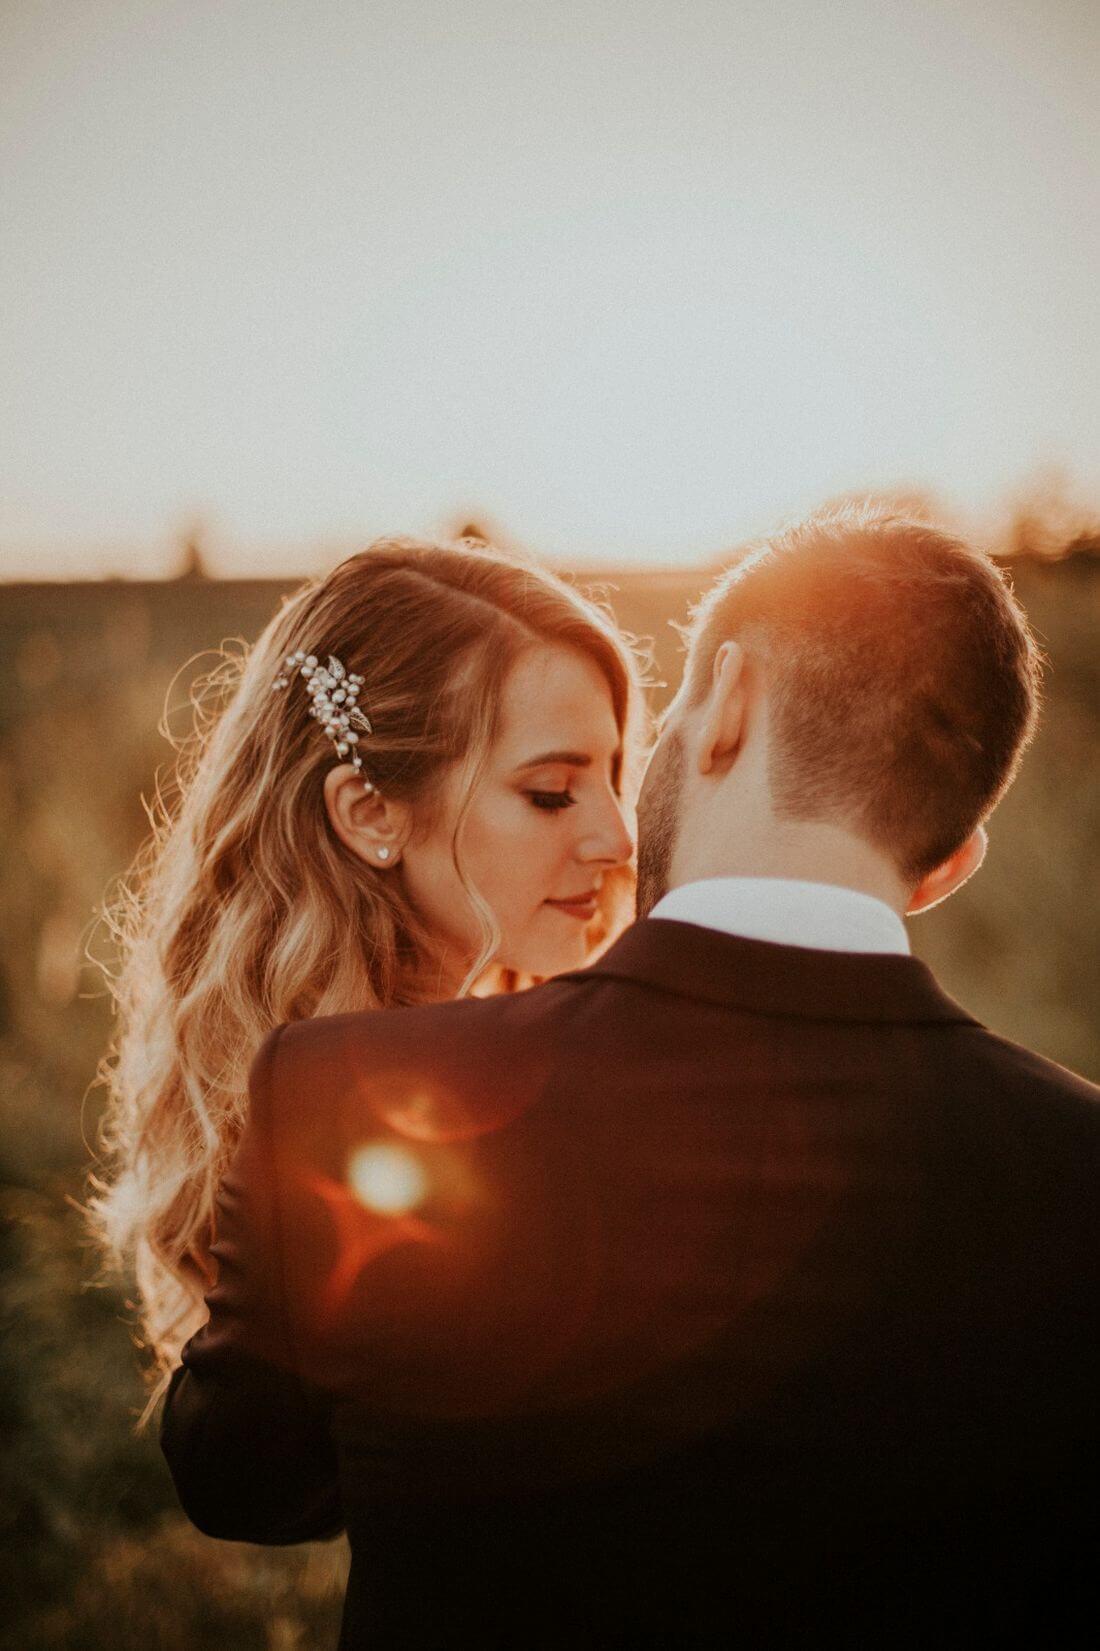 Nunta pe note muzicale – Ana-Maria si Robert – IDO-Weddings-nuntiinaerliber (18)